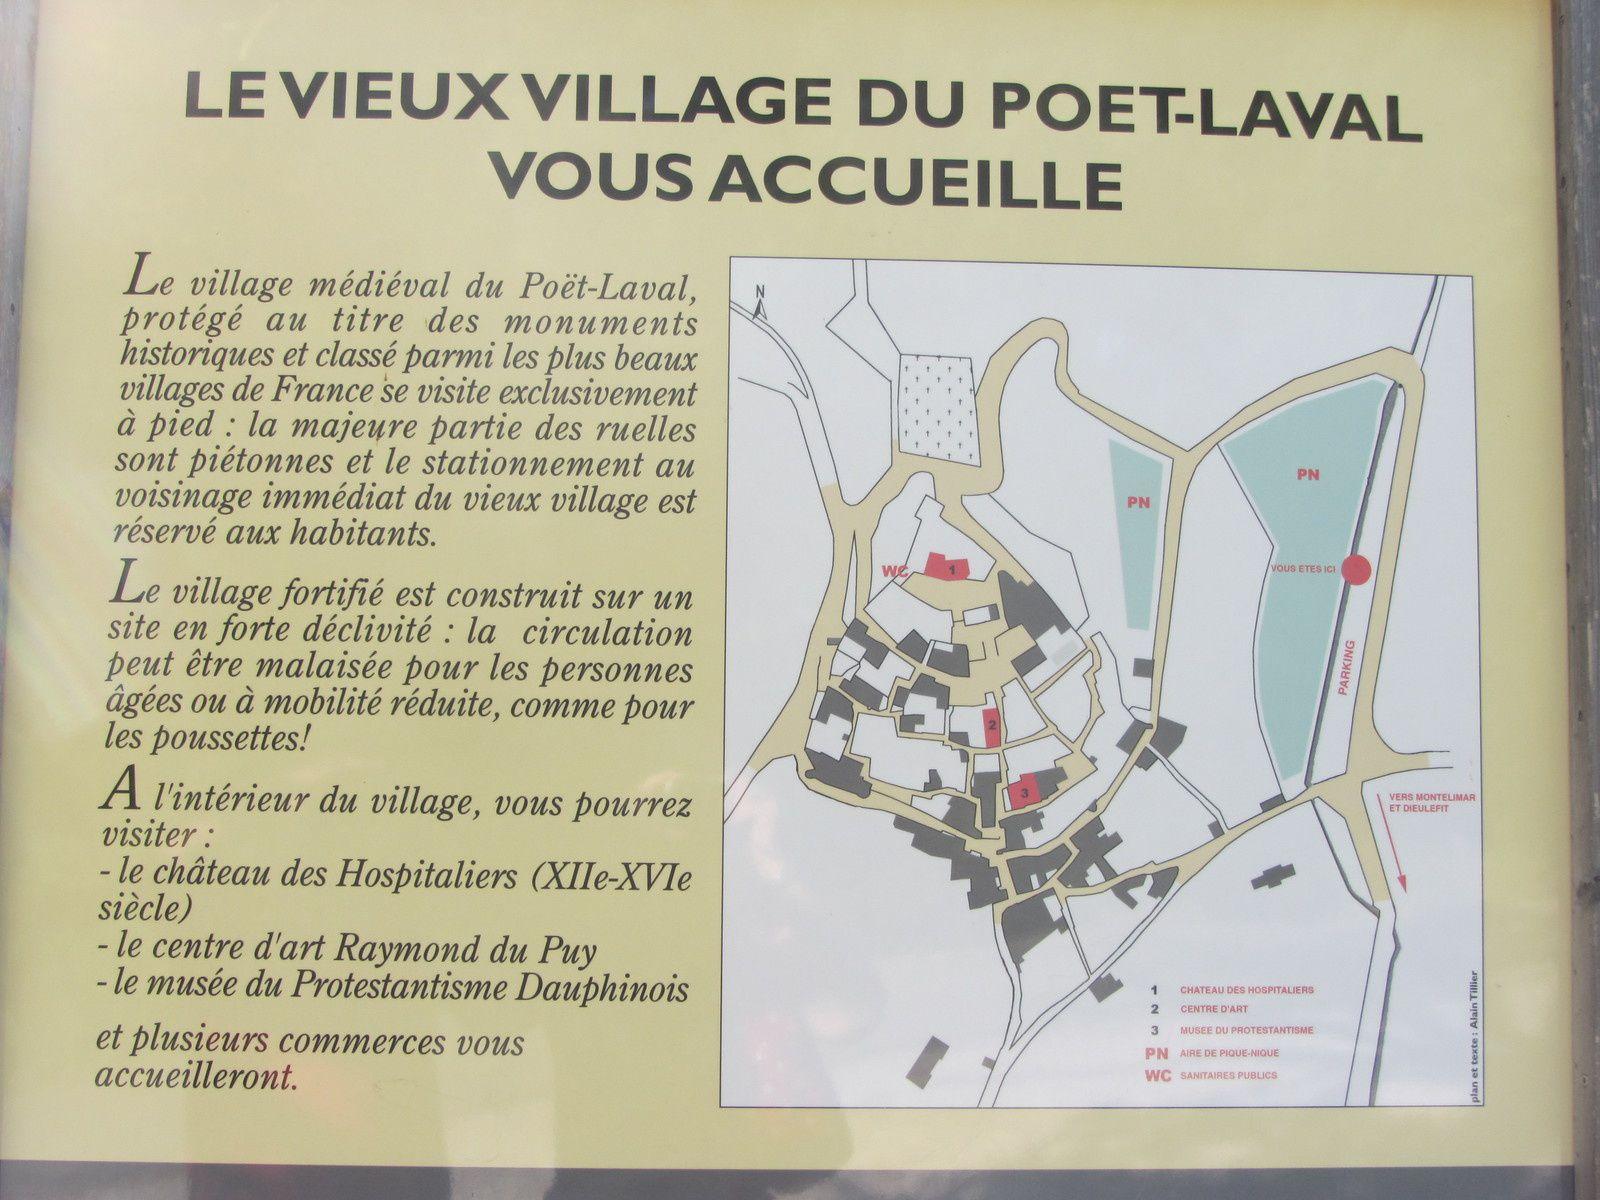 Poët-Laval